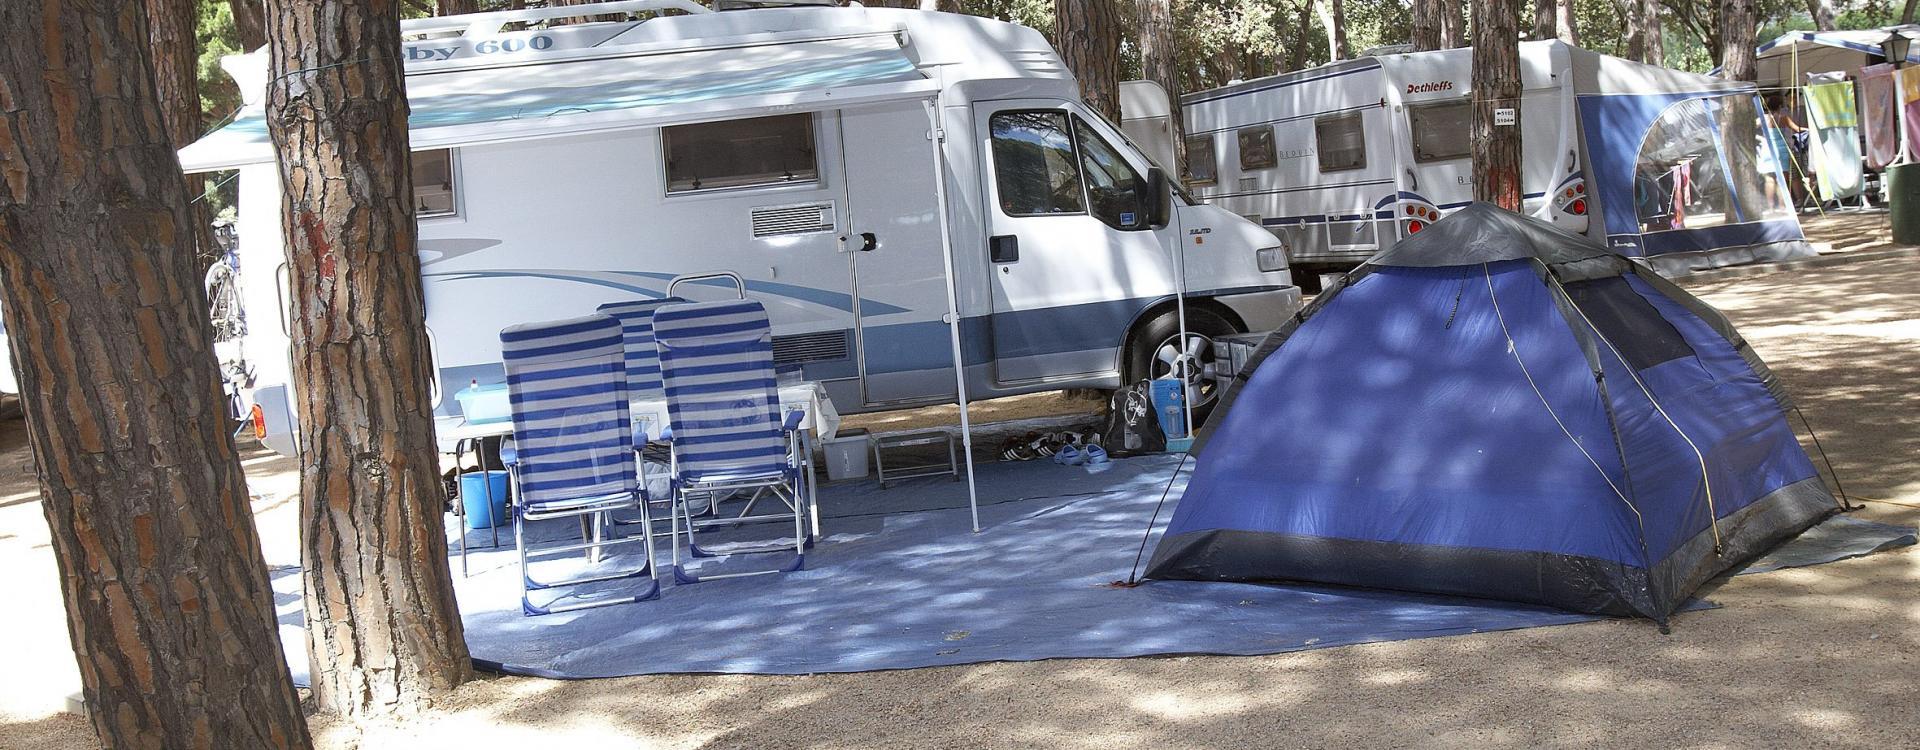 Caravane et tente